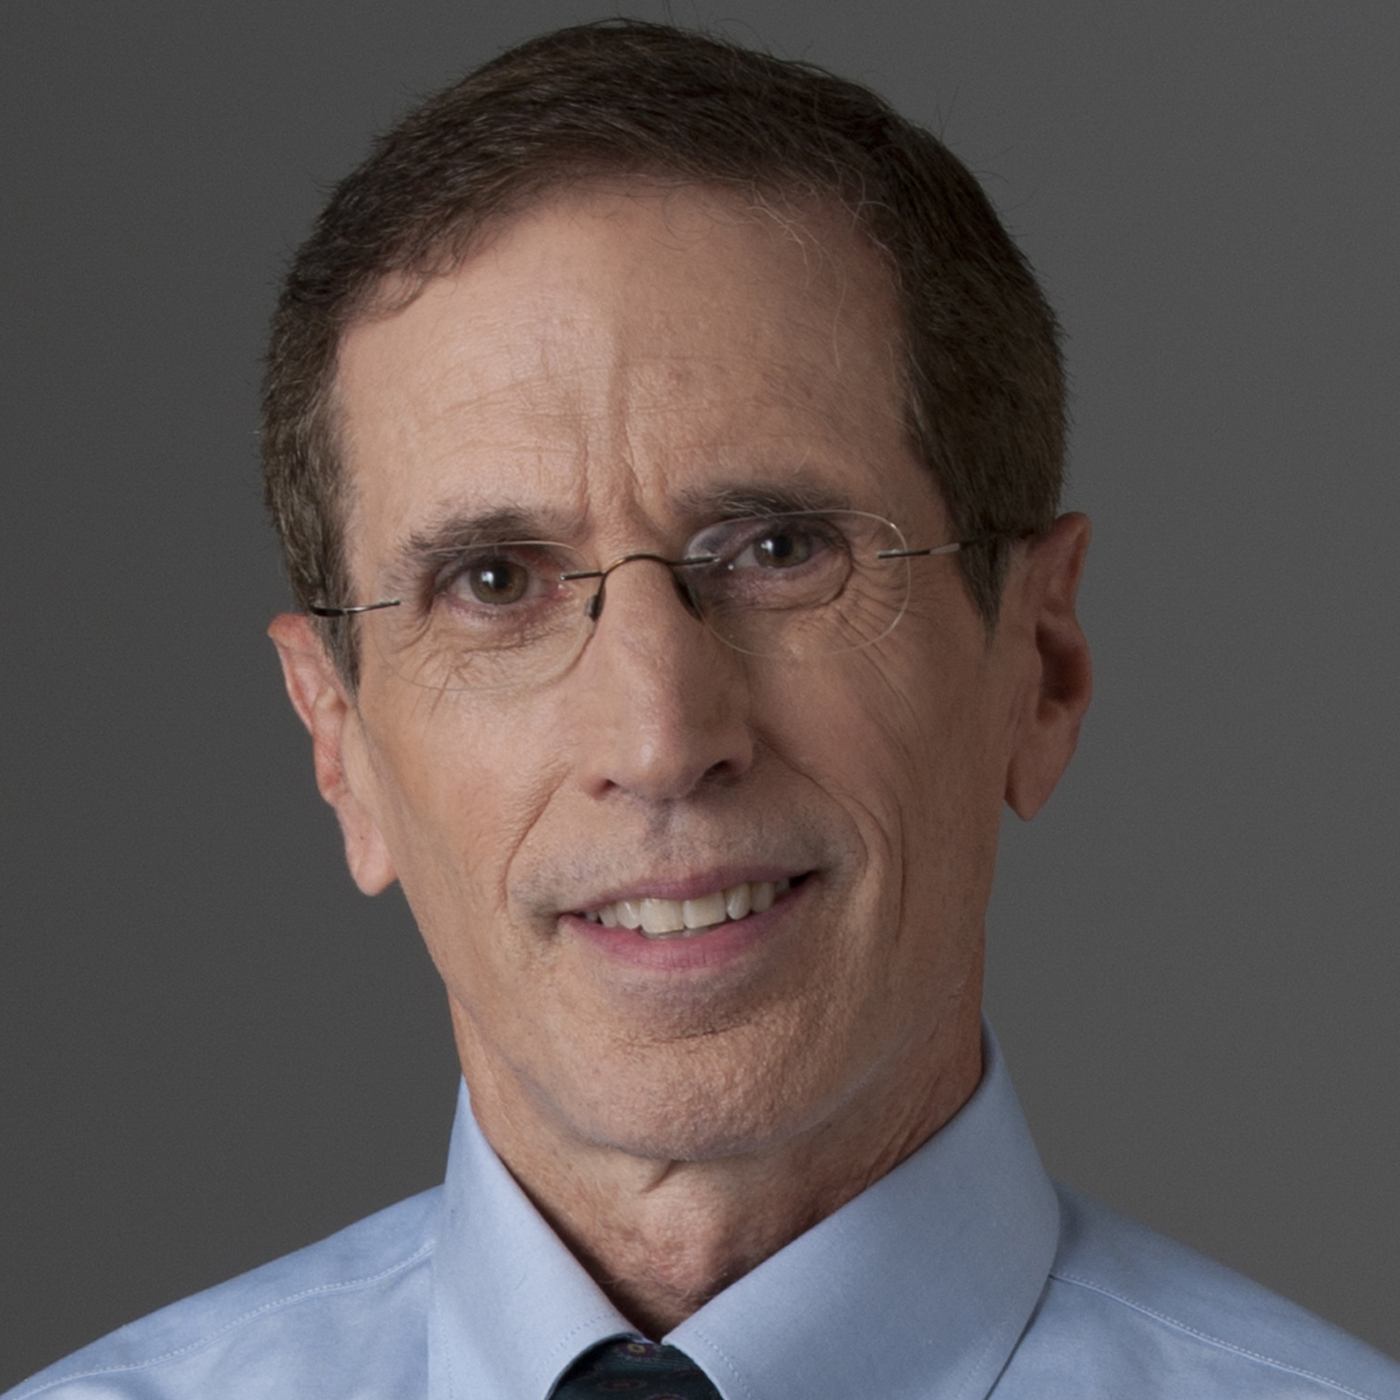 Executive Privilege Audiobook: Craig Windham, NPR Newscaster, Dies : The Two-Way : NPR